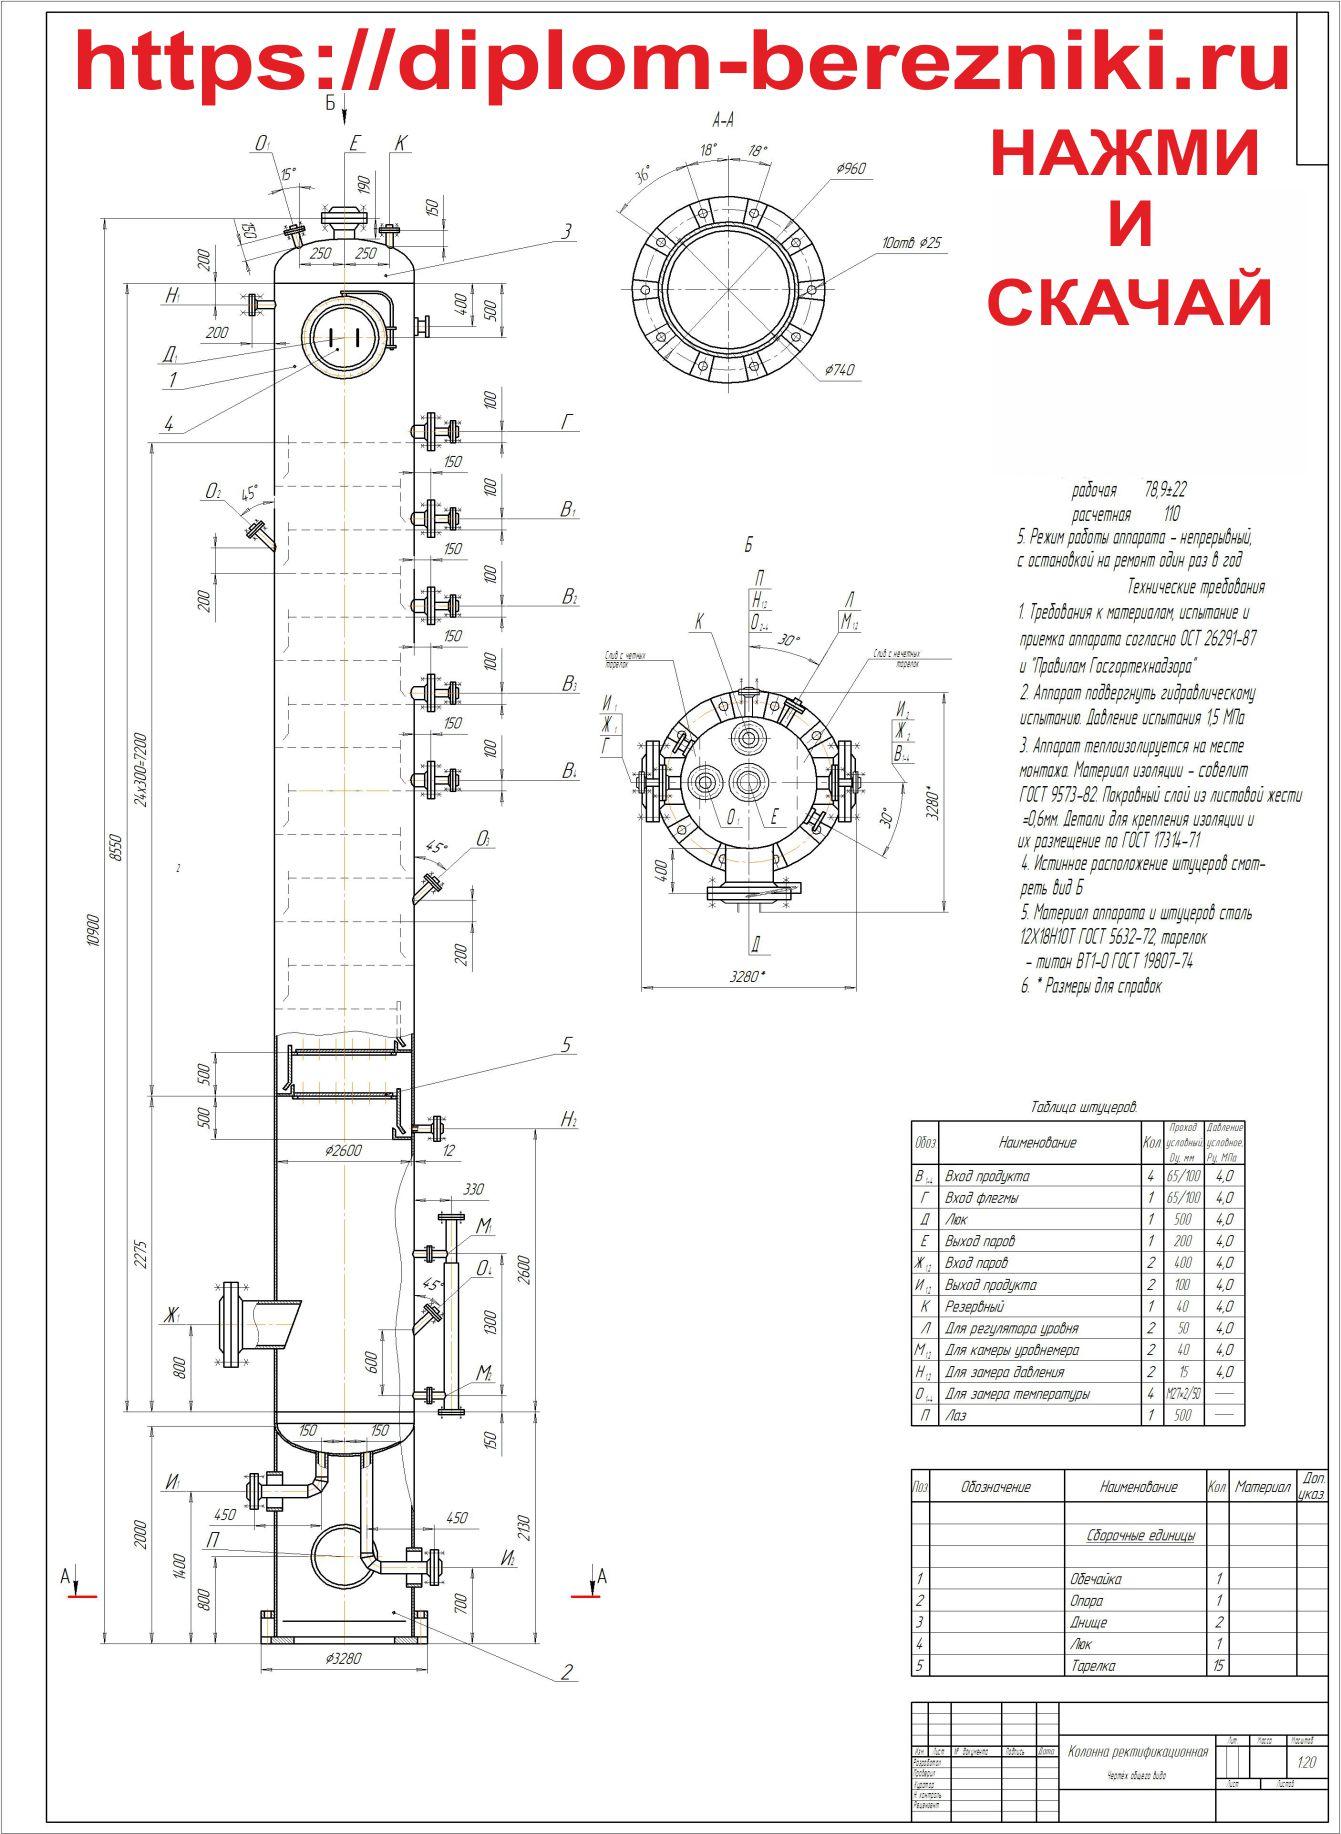 Ректификационная колонна